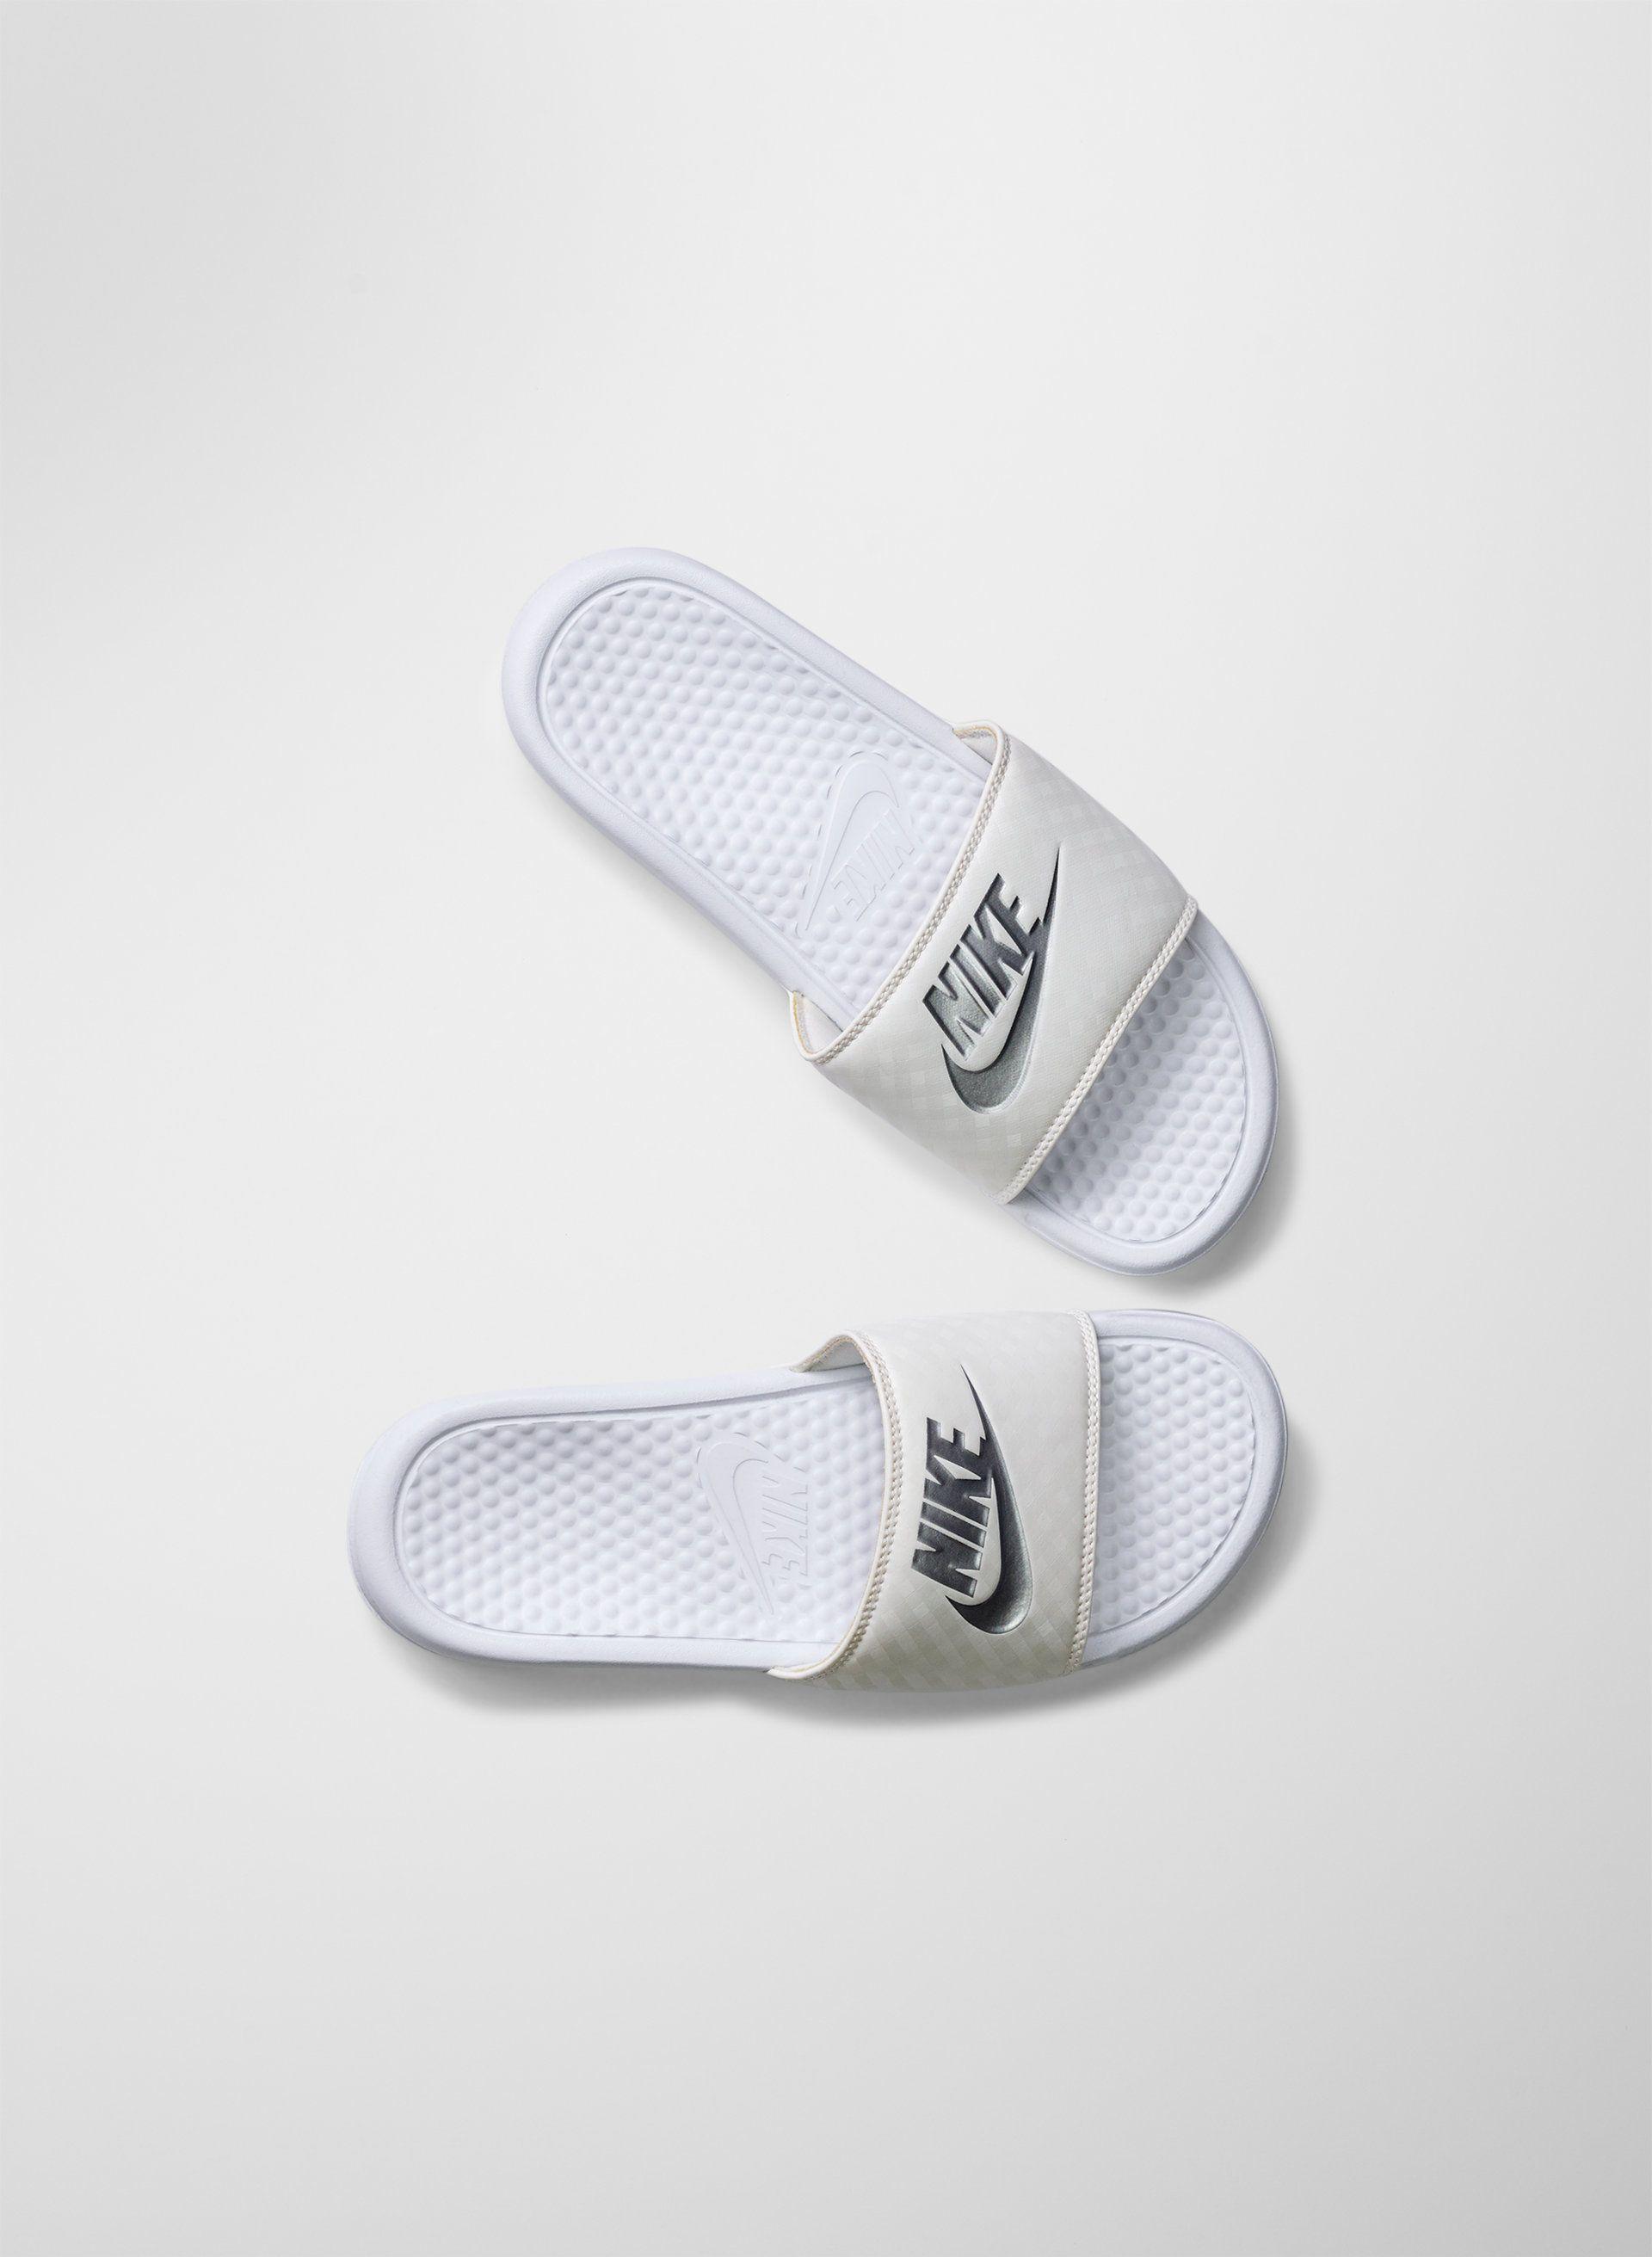 Nike BENASSI SLIDES | Aritzia